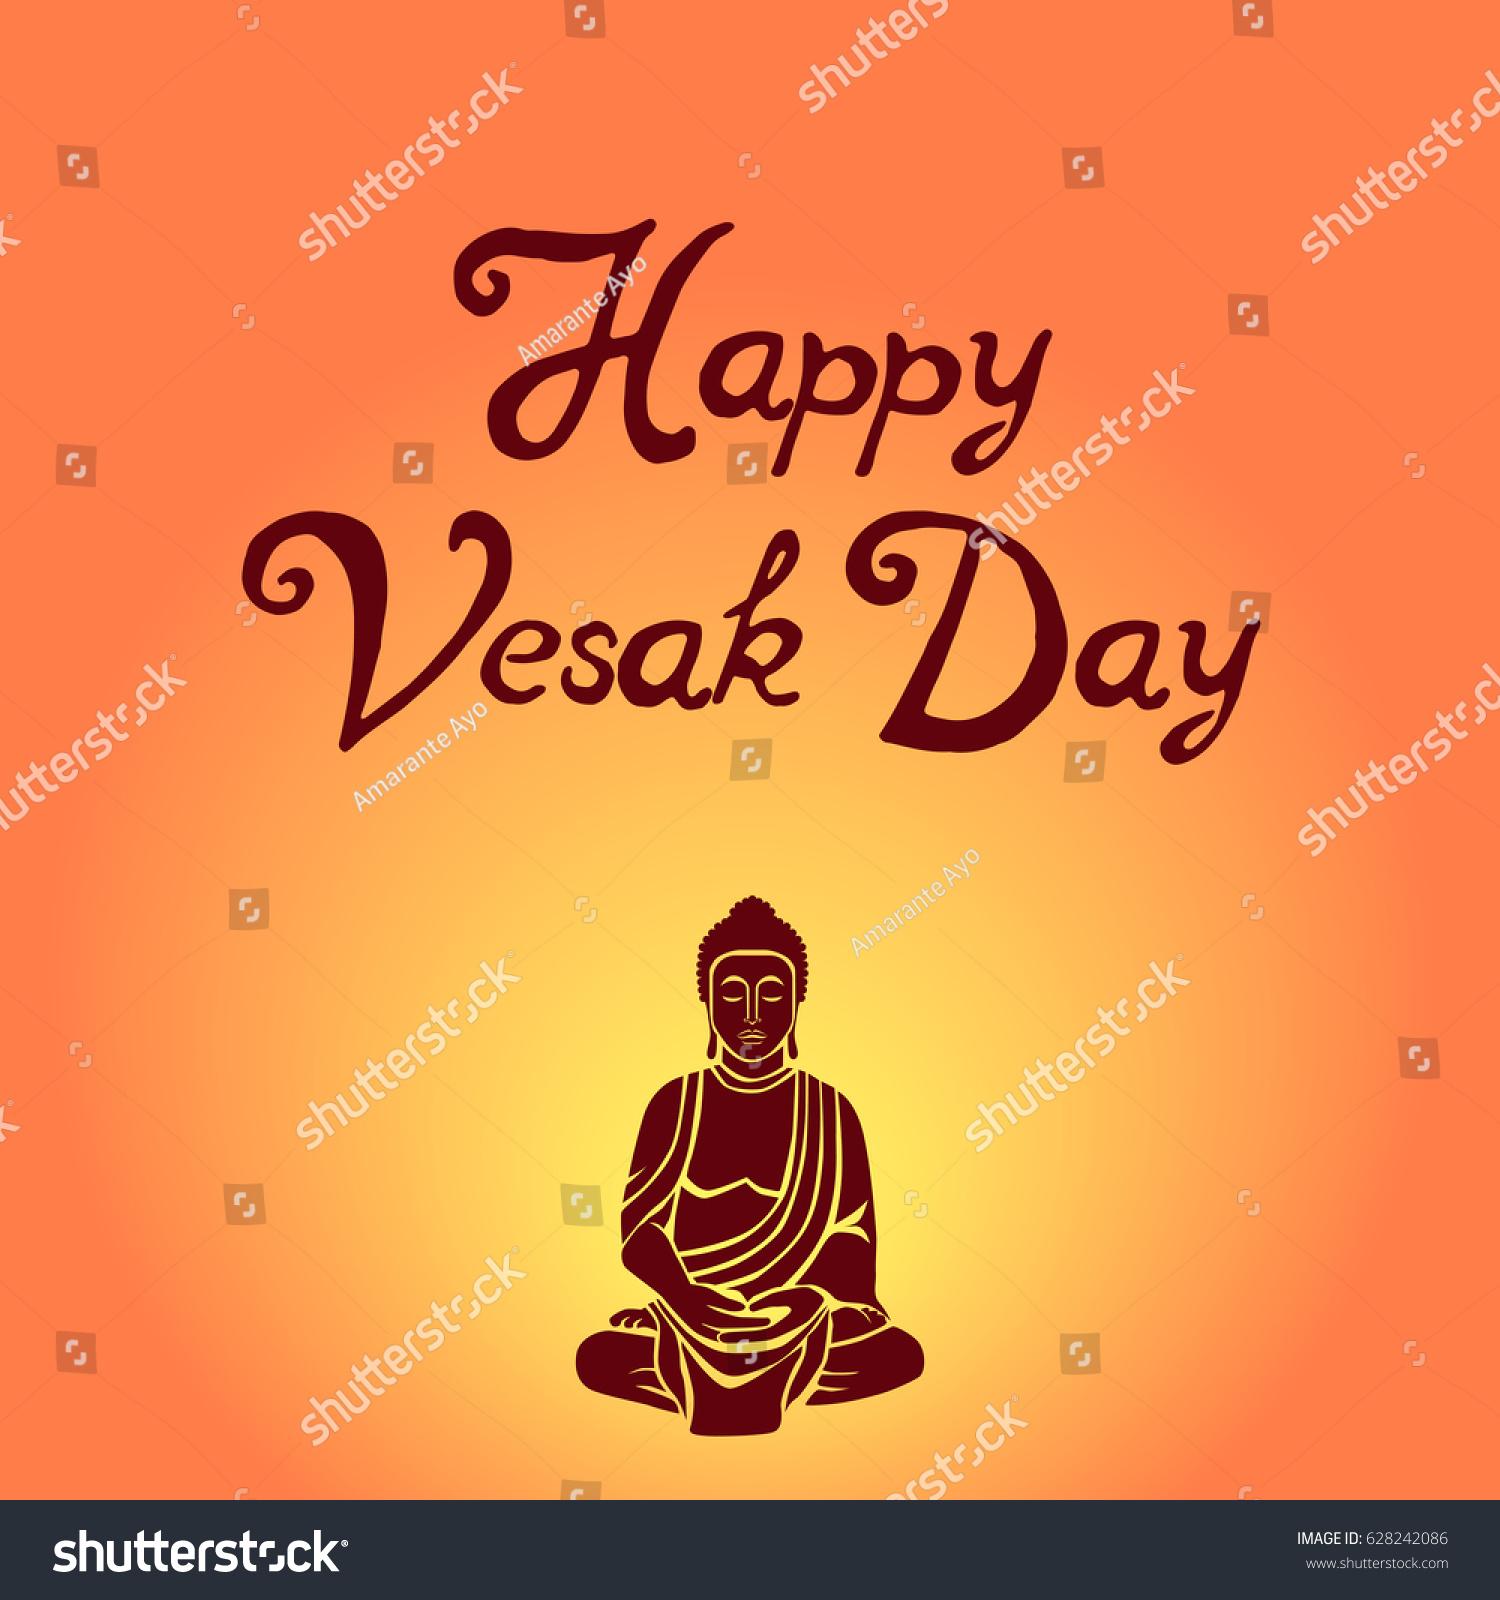 Religion Vesak Day Celebration Colorful Unique Stock Vector Royalty